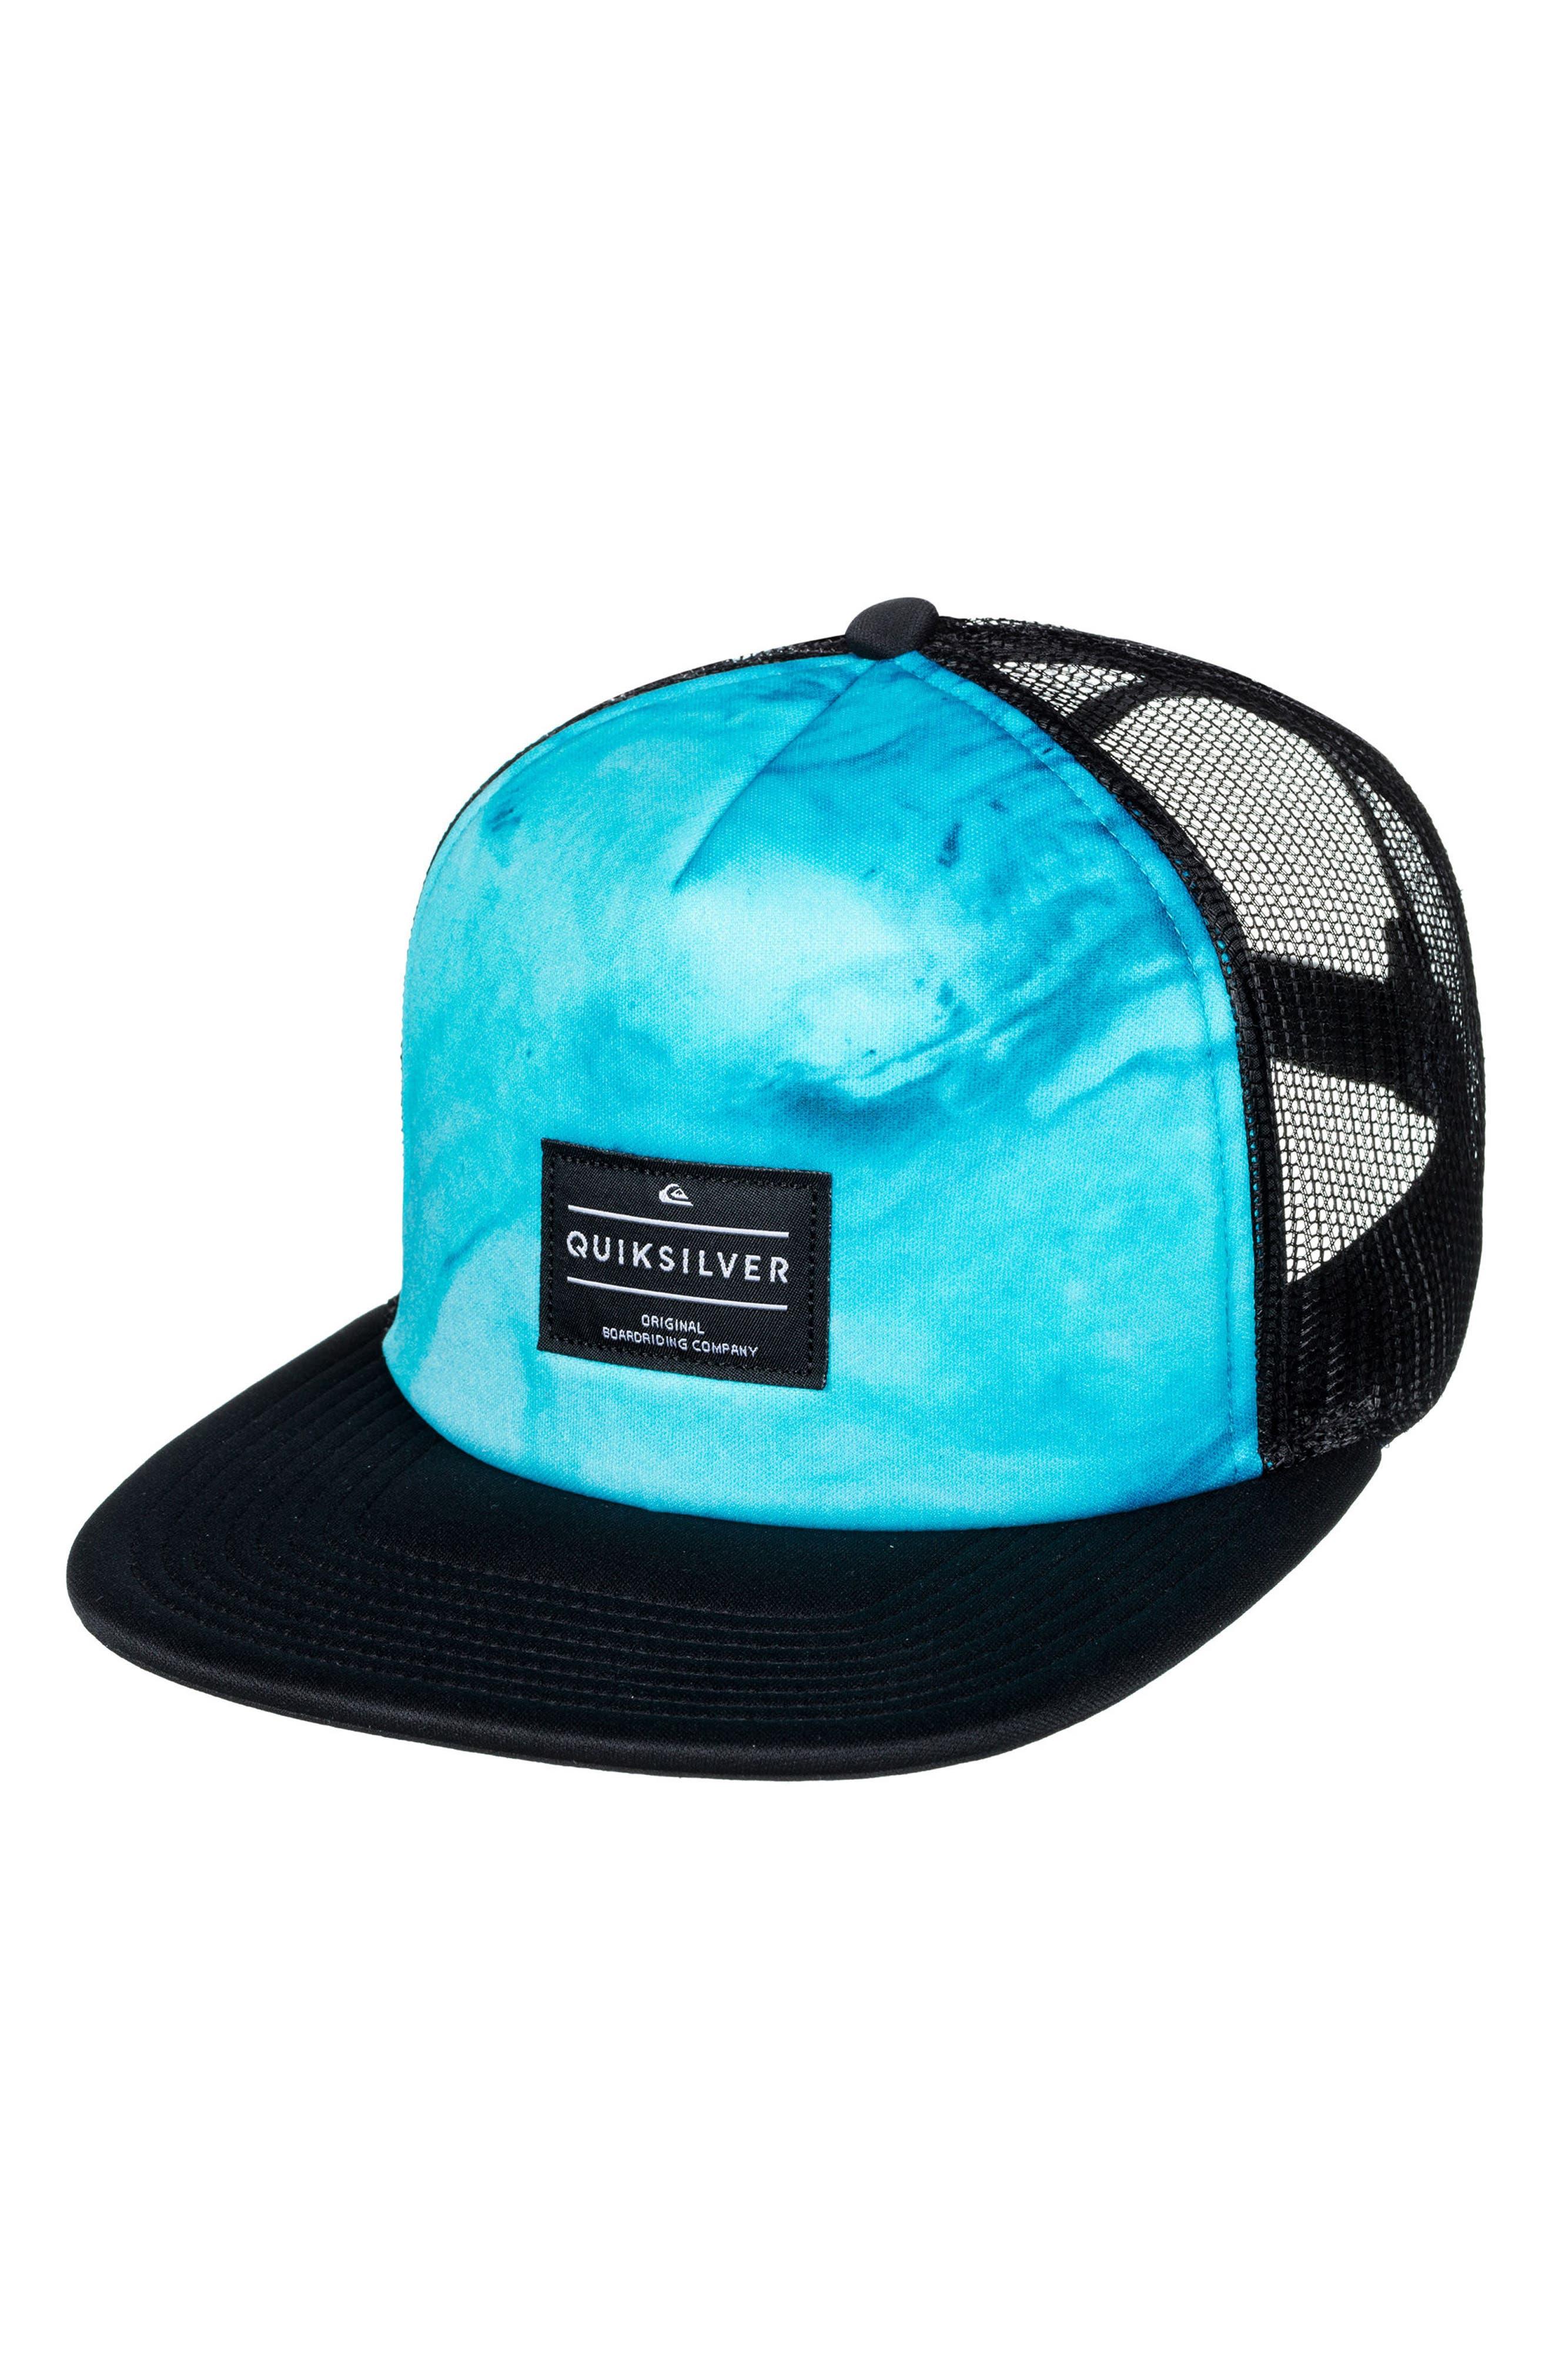 Brissells Snapback Trucker Hat,                             Main thumbnail 1, color,                             Black